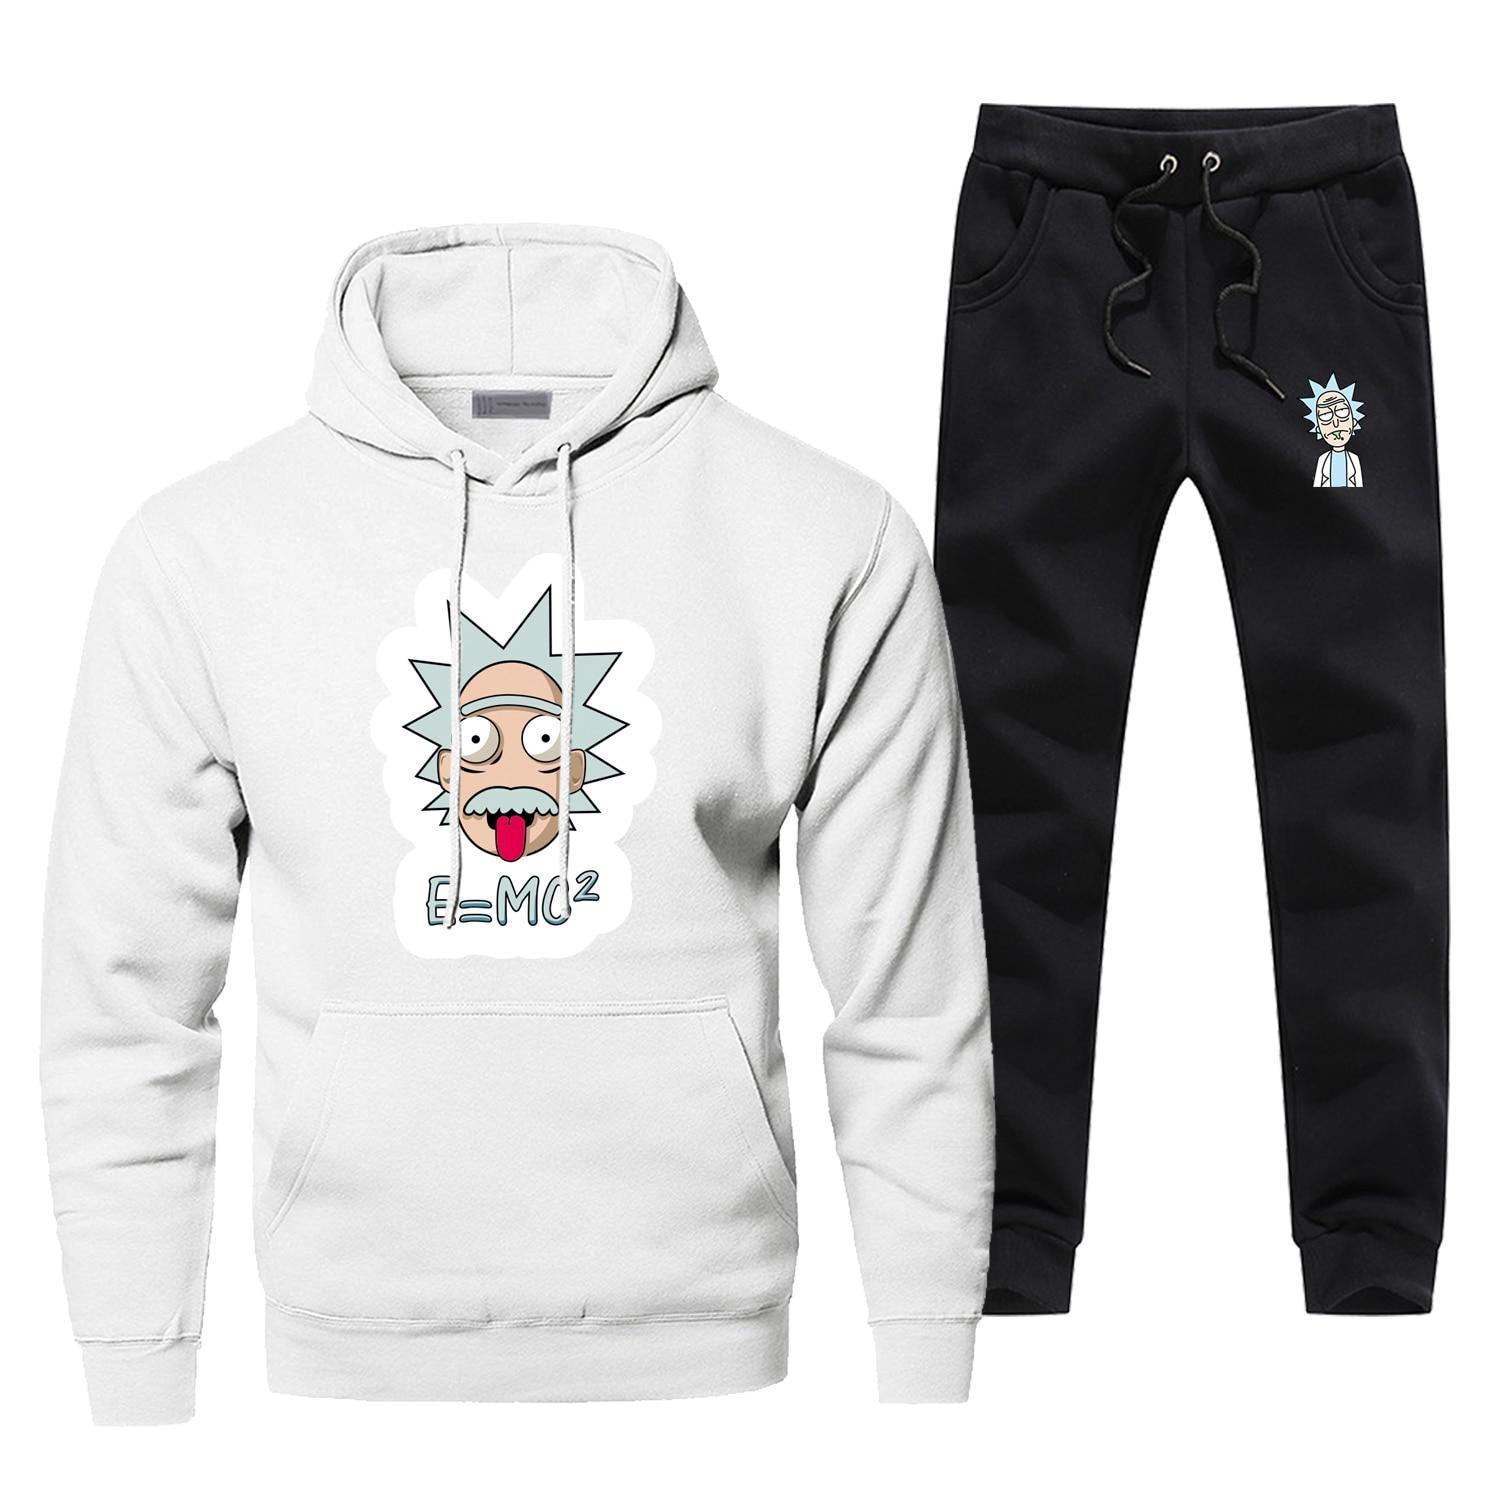 Rick And Morty Funny Einstein Print Hoodies Sweatshirts Set 2019 Winter Bodywarmer Anime Men's Full Suit Tracksuit Streetwear